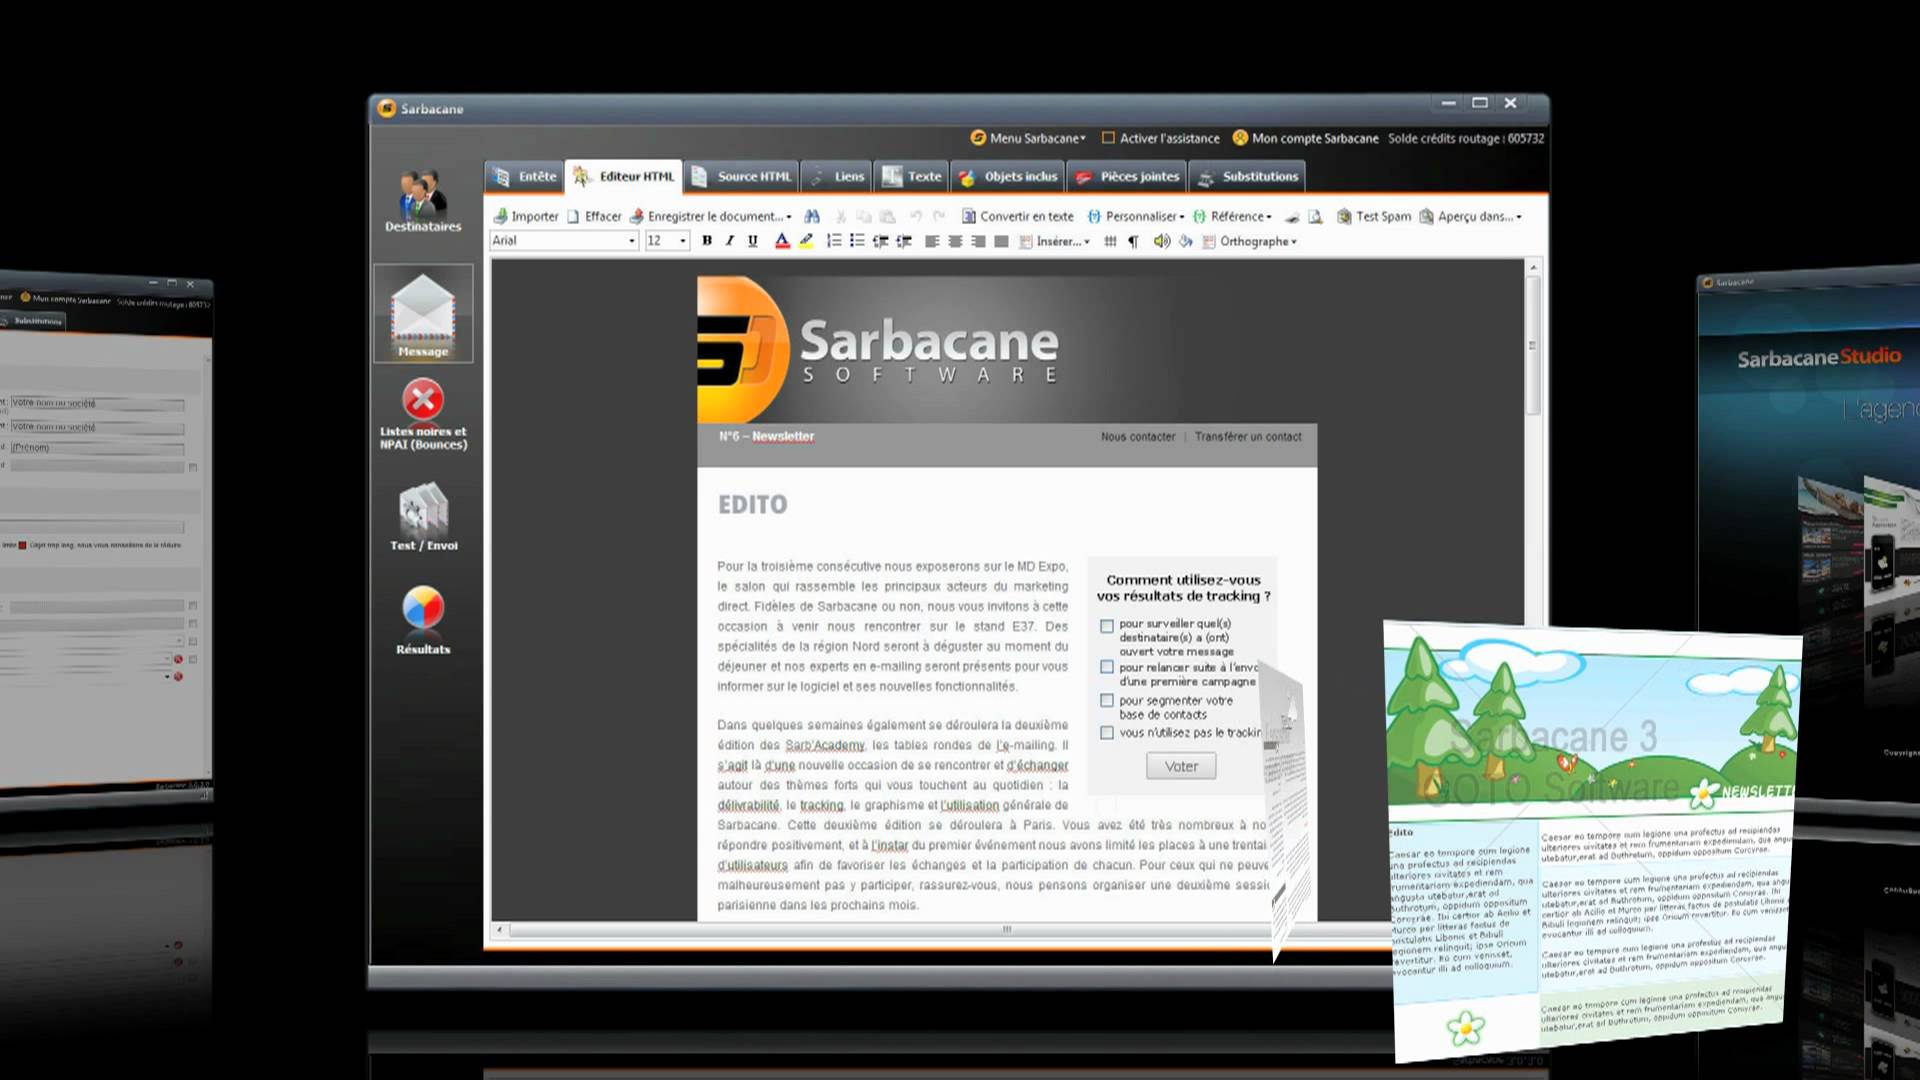 sarbacane 3